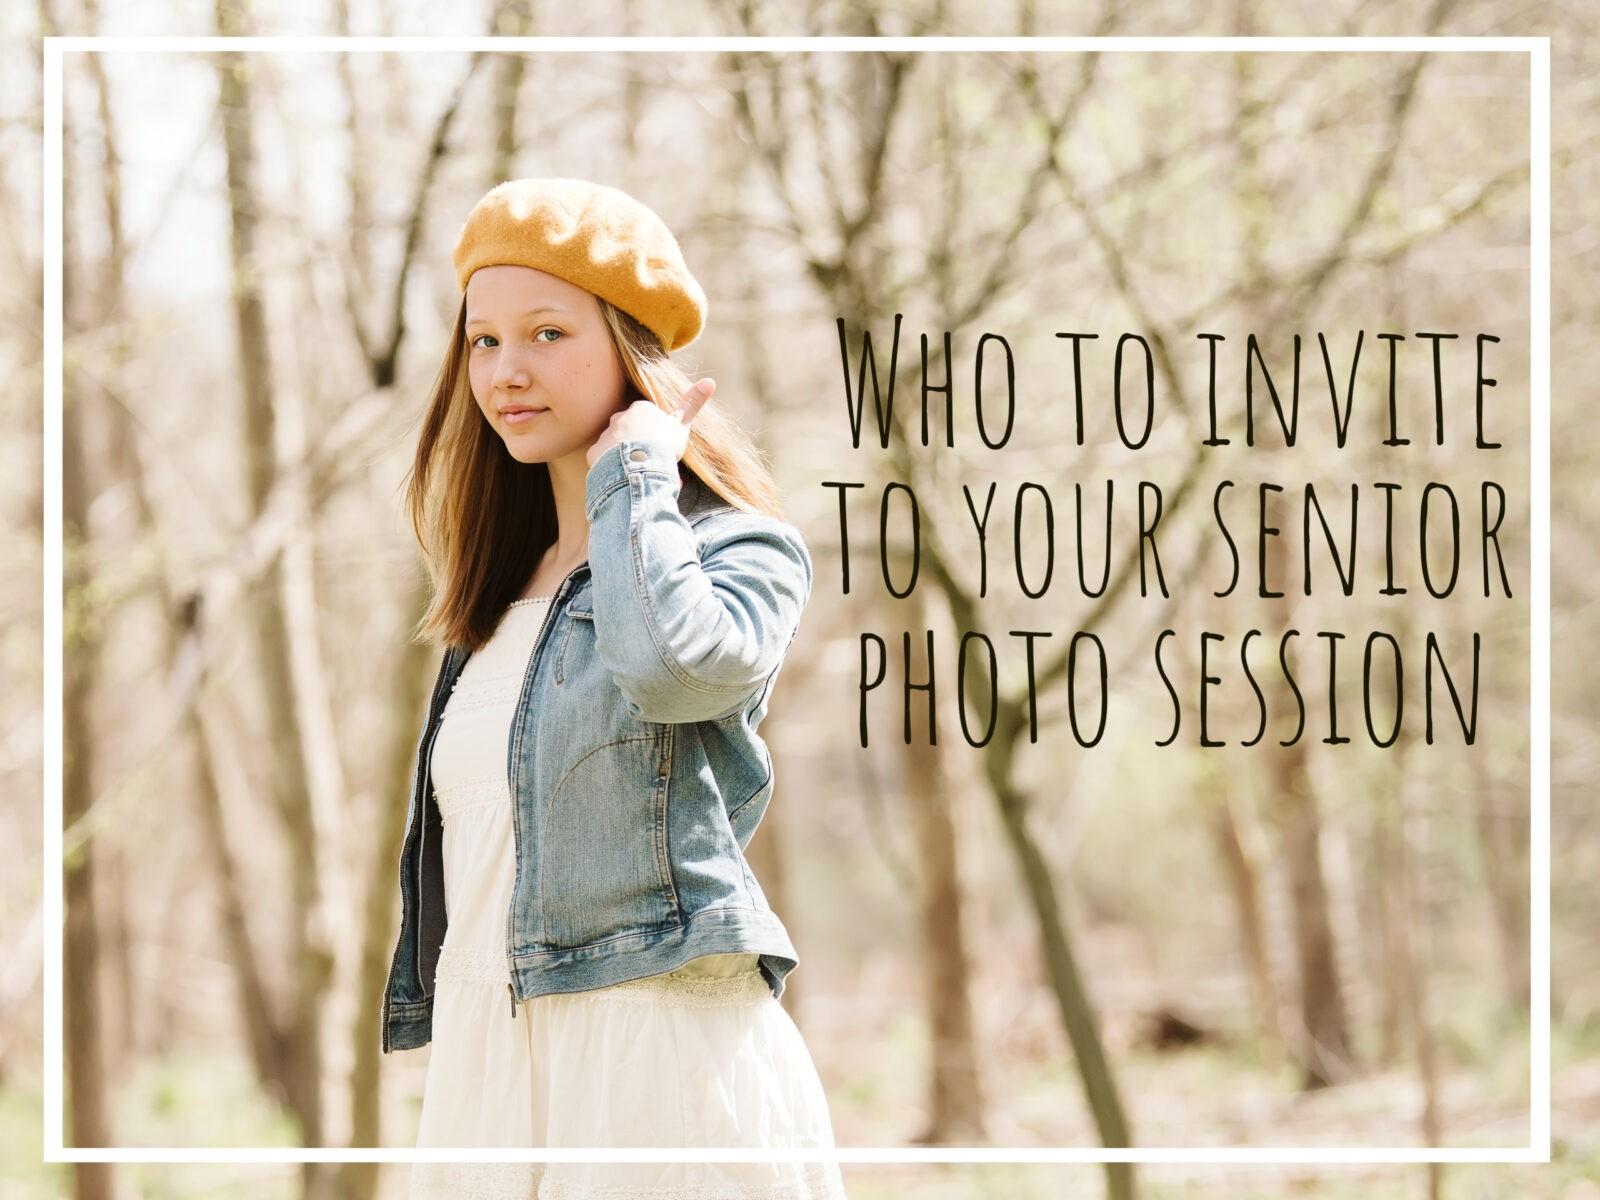 Who to Invite to Your Senior Photo Session